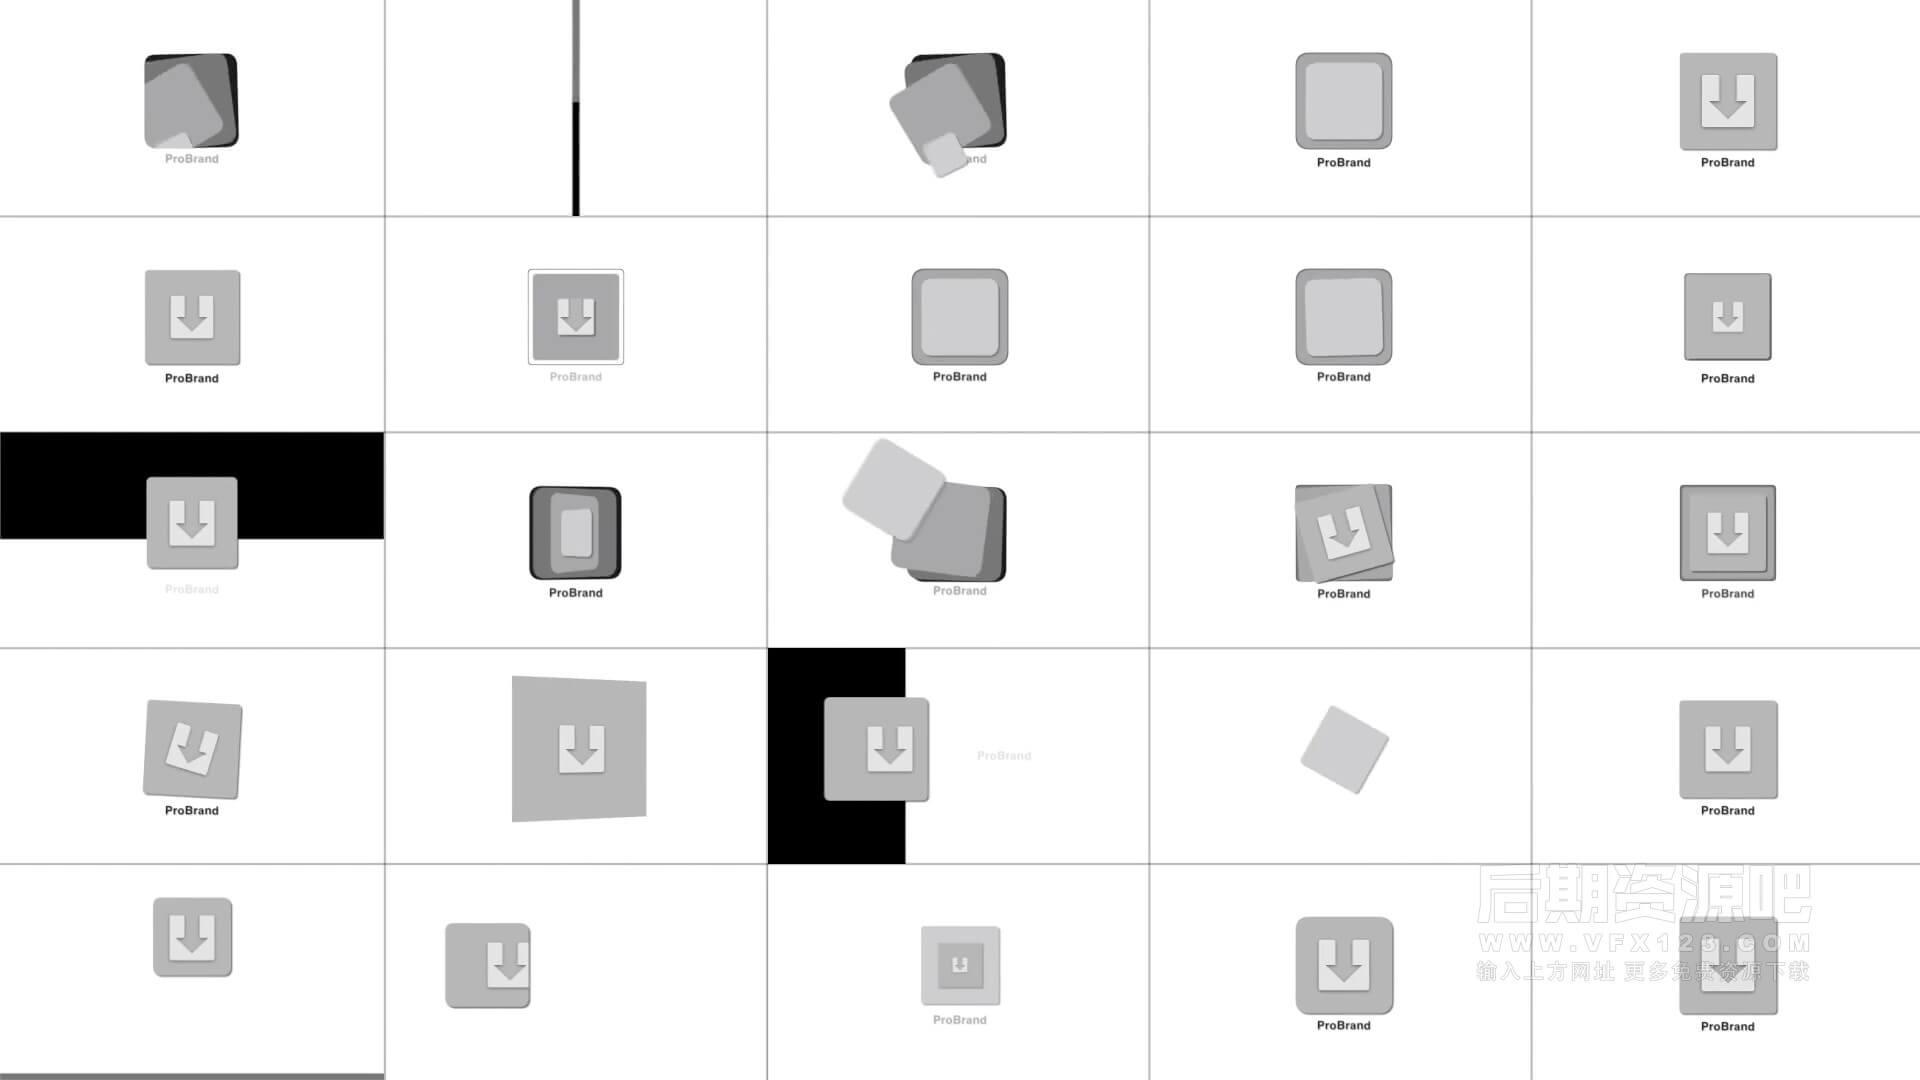 fcpx插件 30组创意徽标LOGO展示动画模板 ProBrand Reveal V7